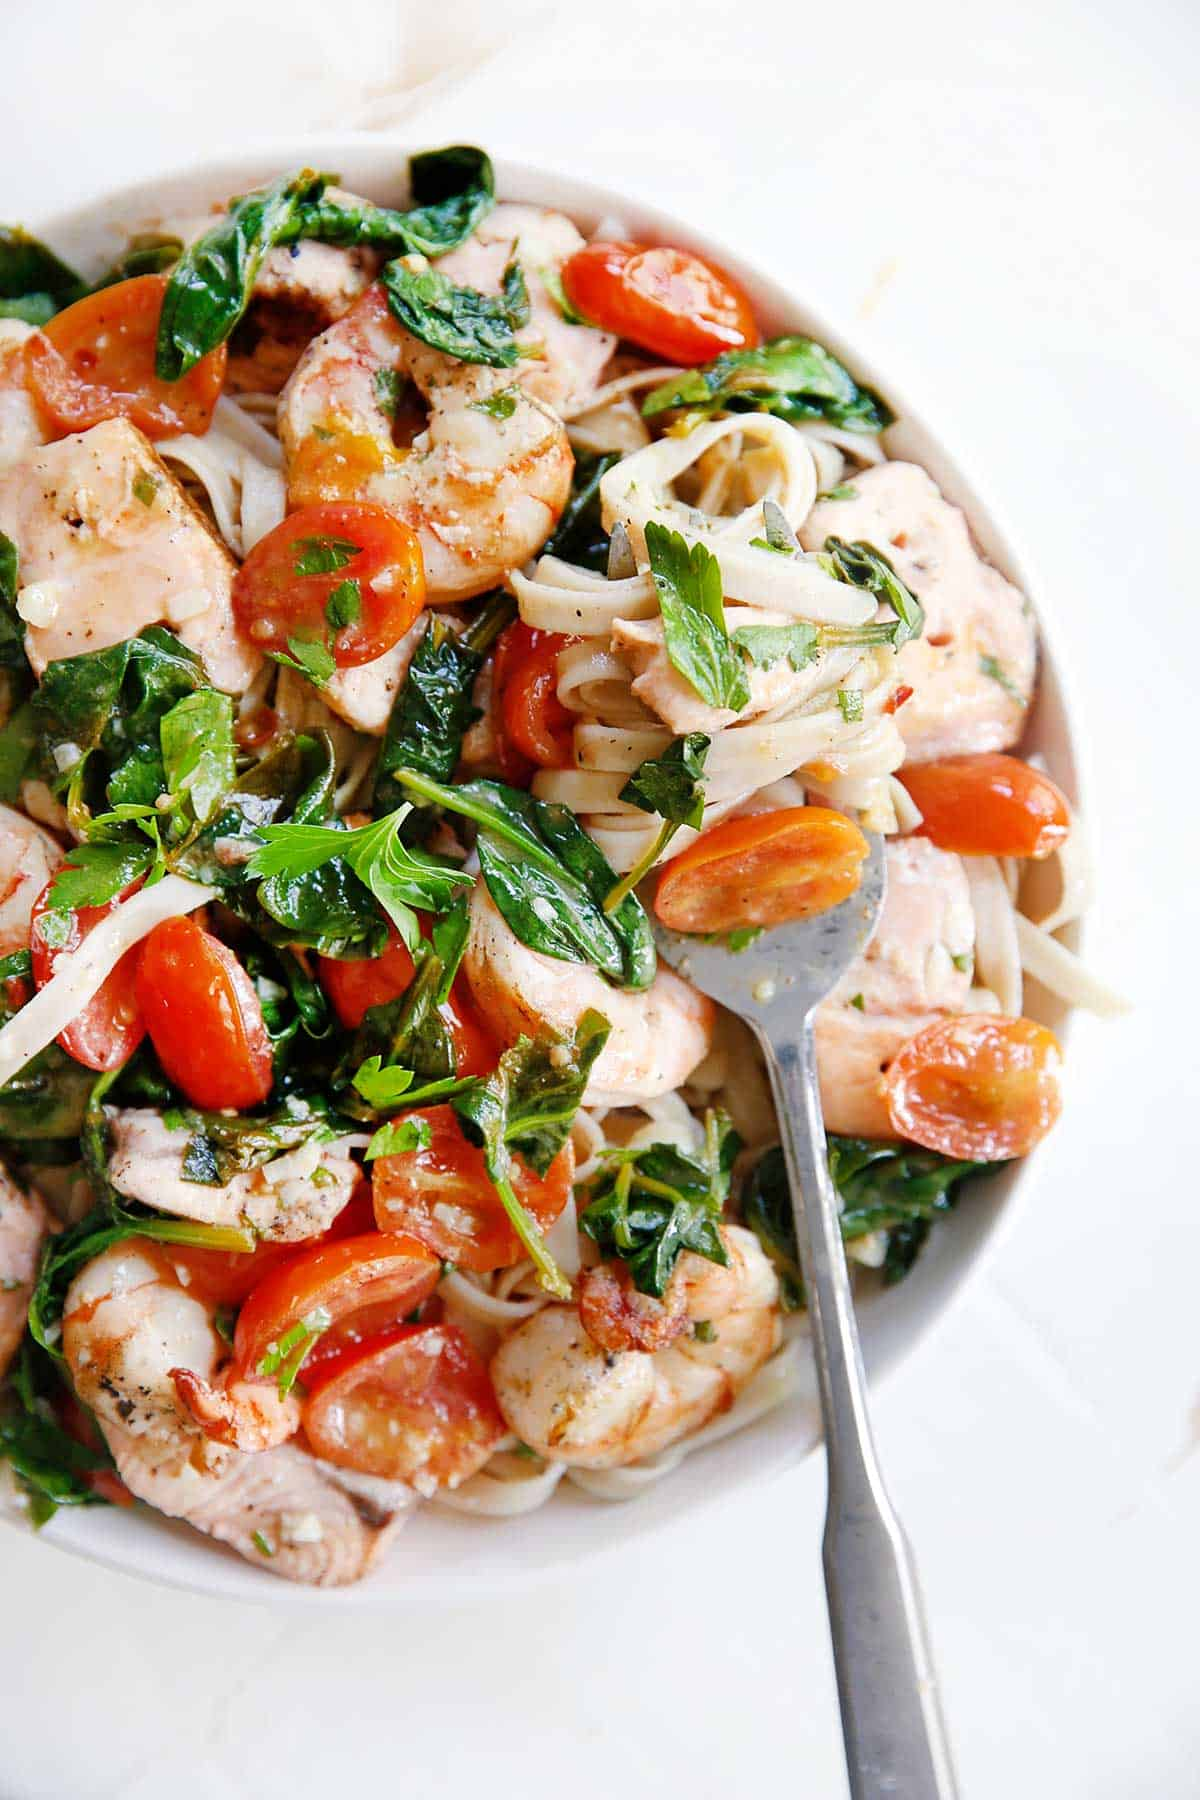 Grilled Shrimp Salmon Scampi | Lexi's Clean Kitchen